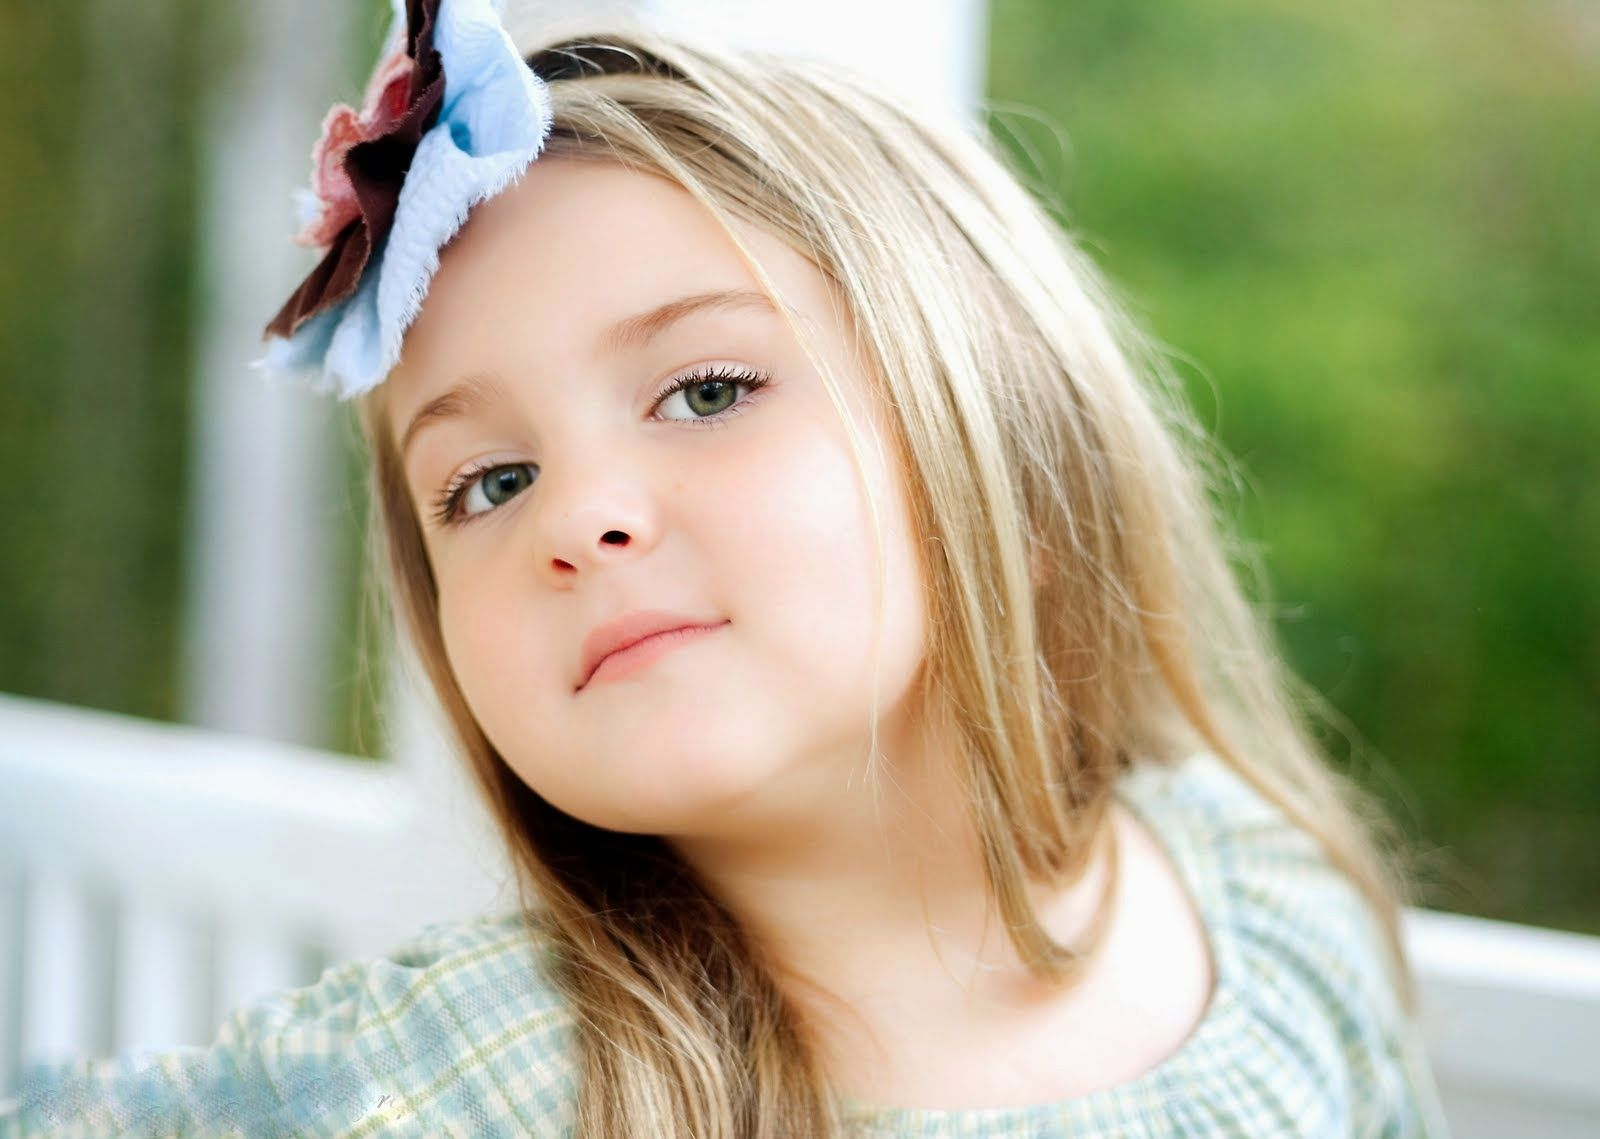 بالصور فتيات جميلات , صور بنات اطفال يجننوا 4374 9